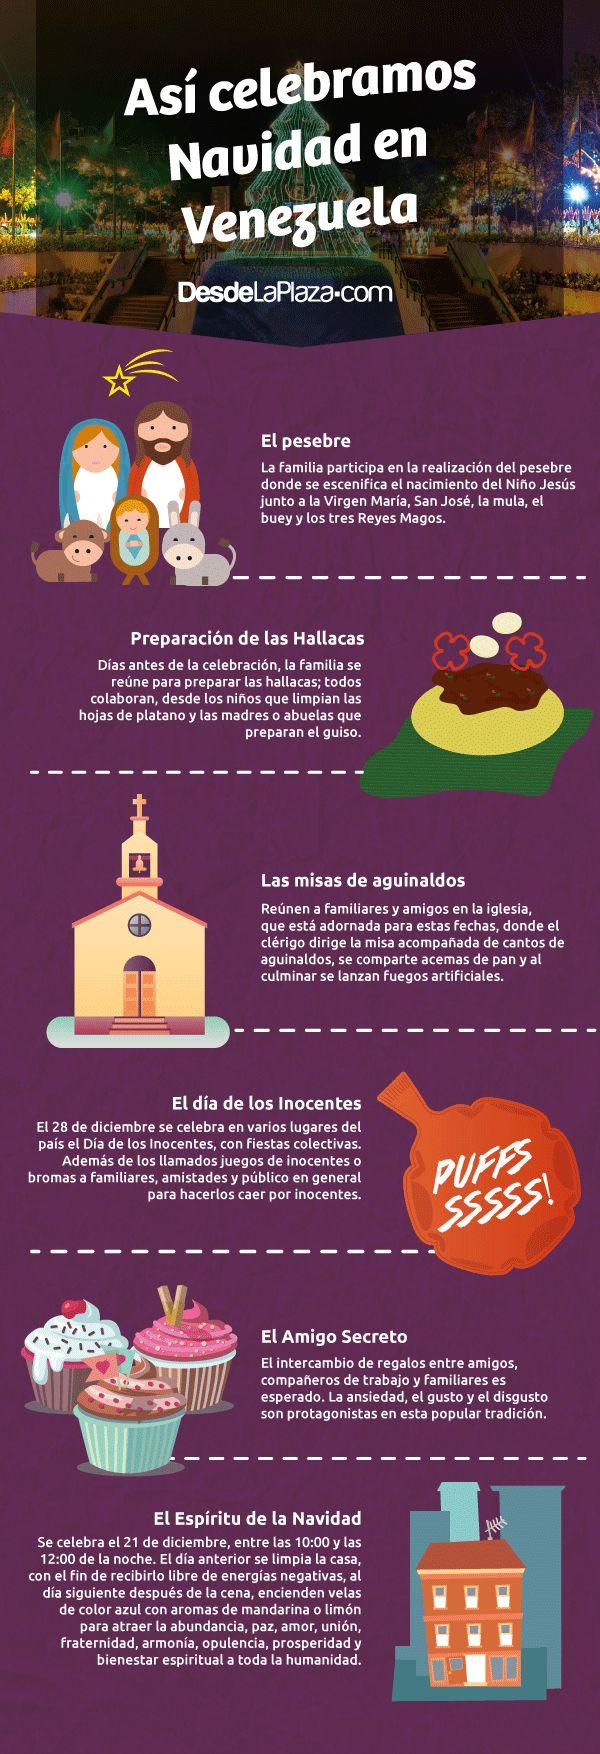 Costumbres navideñas venezolanas